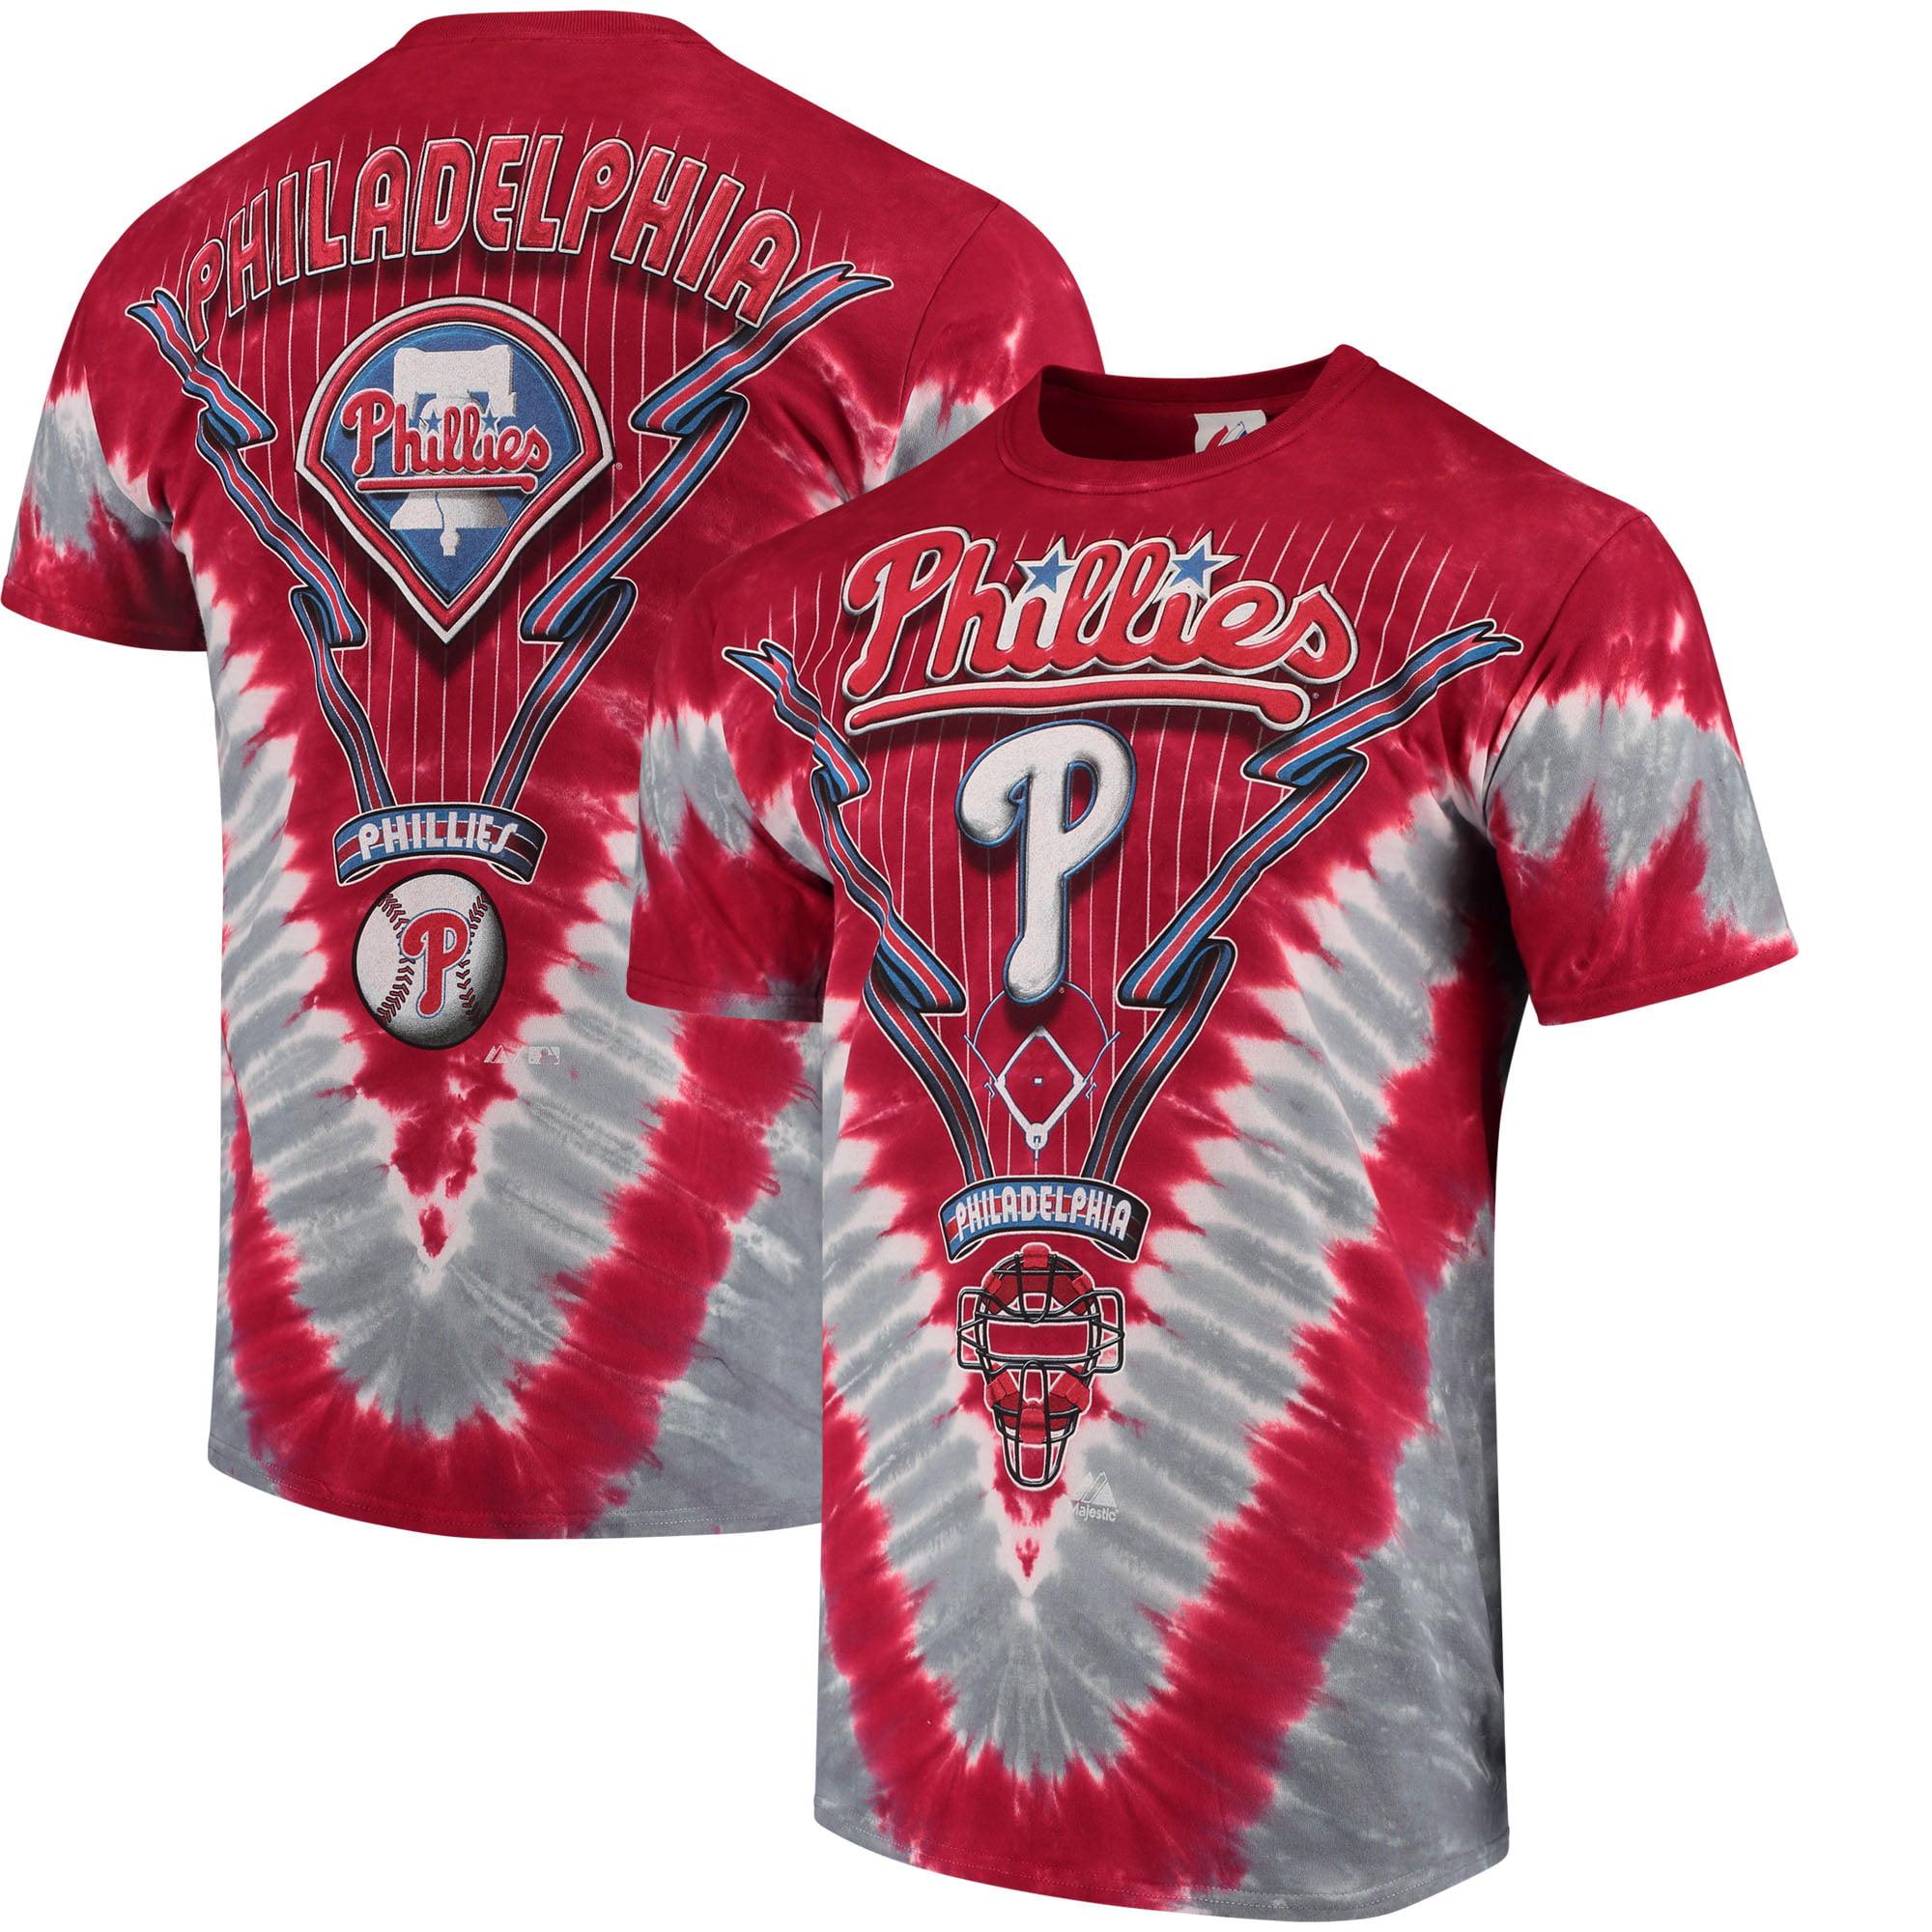 Philadelphia Phillies - Logo V Tie-Dye T-Shirt